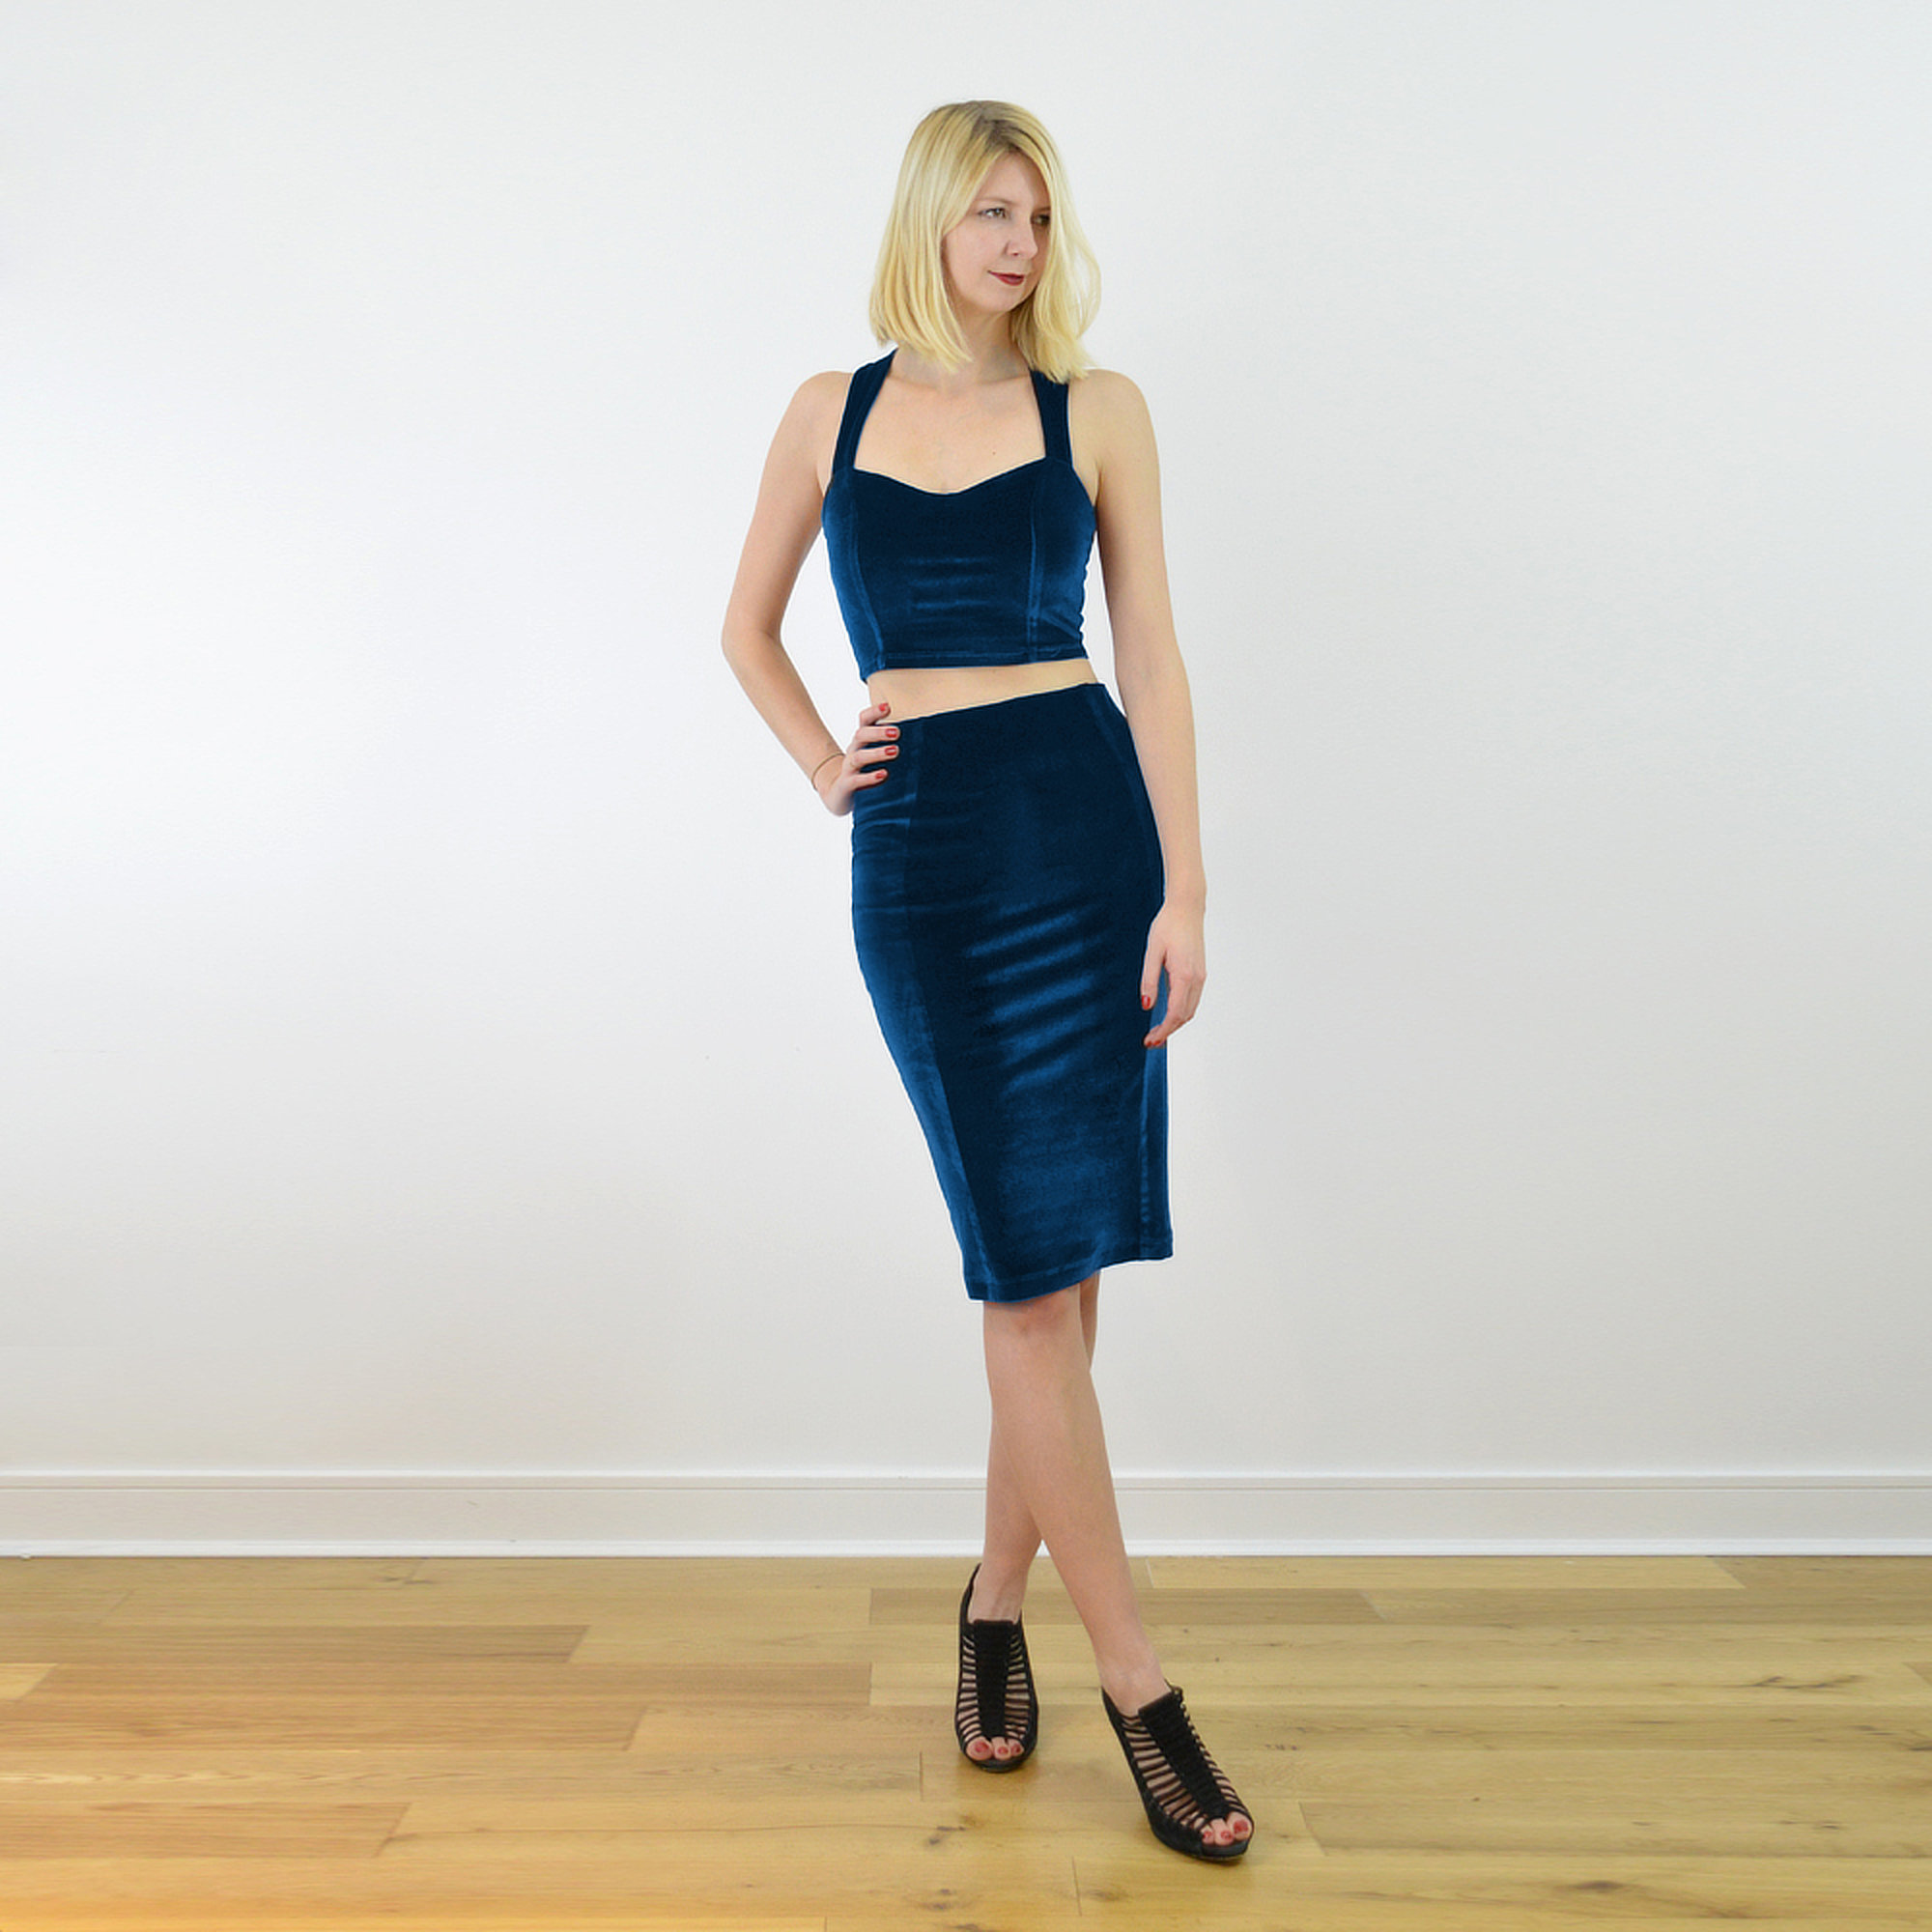 Kirsten Crop Top And Pencil Skirt Set In Navy Blue Velvet Stylecamp